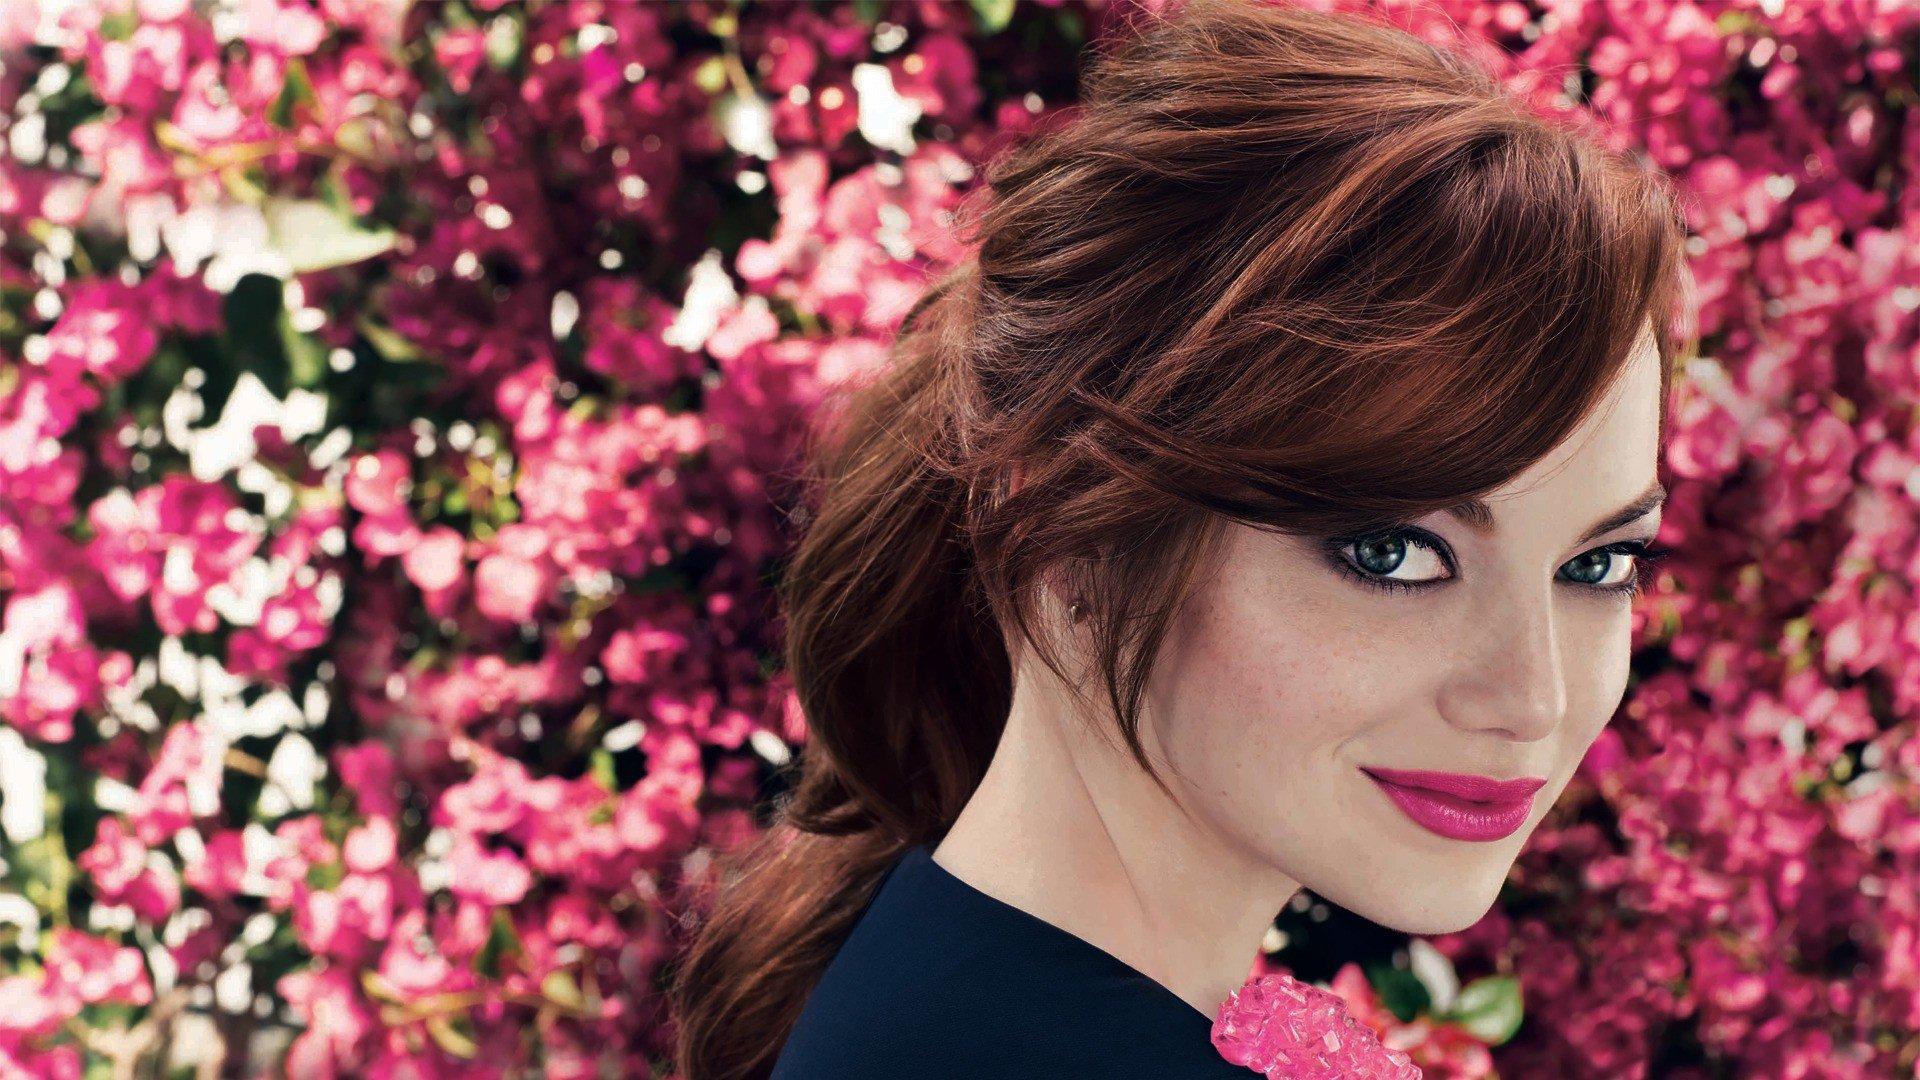 Emma Stone, Face, Blue eyes, Actress Wallpaper